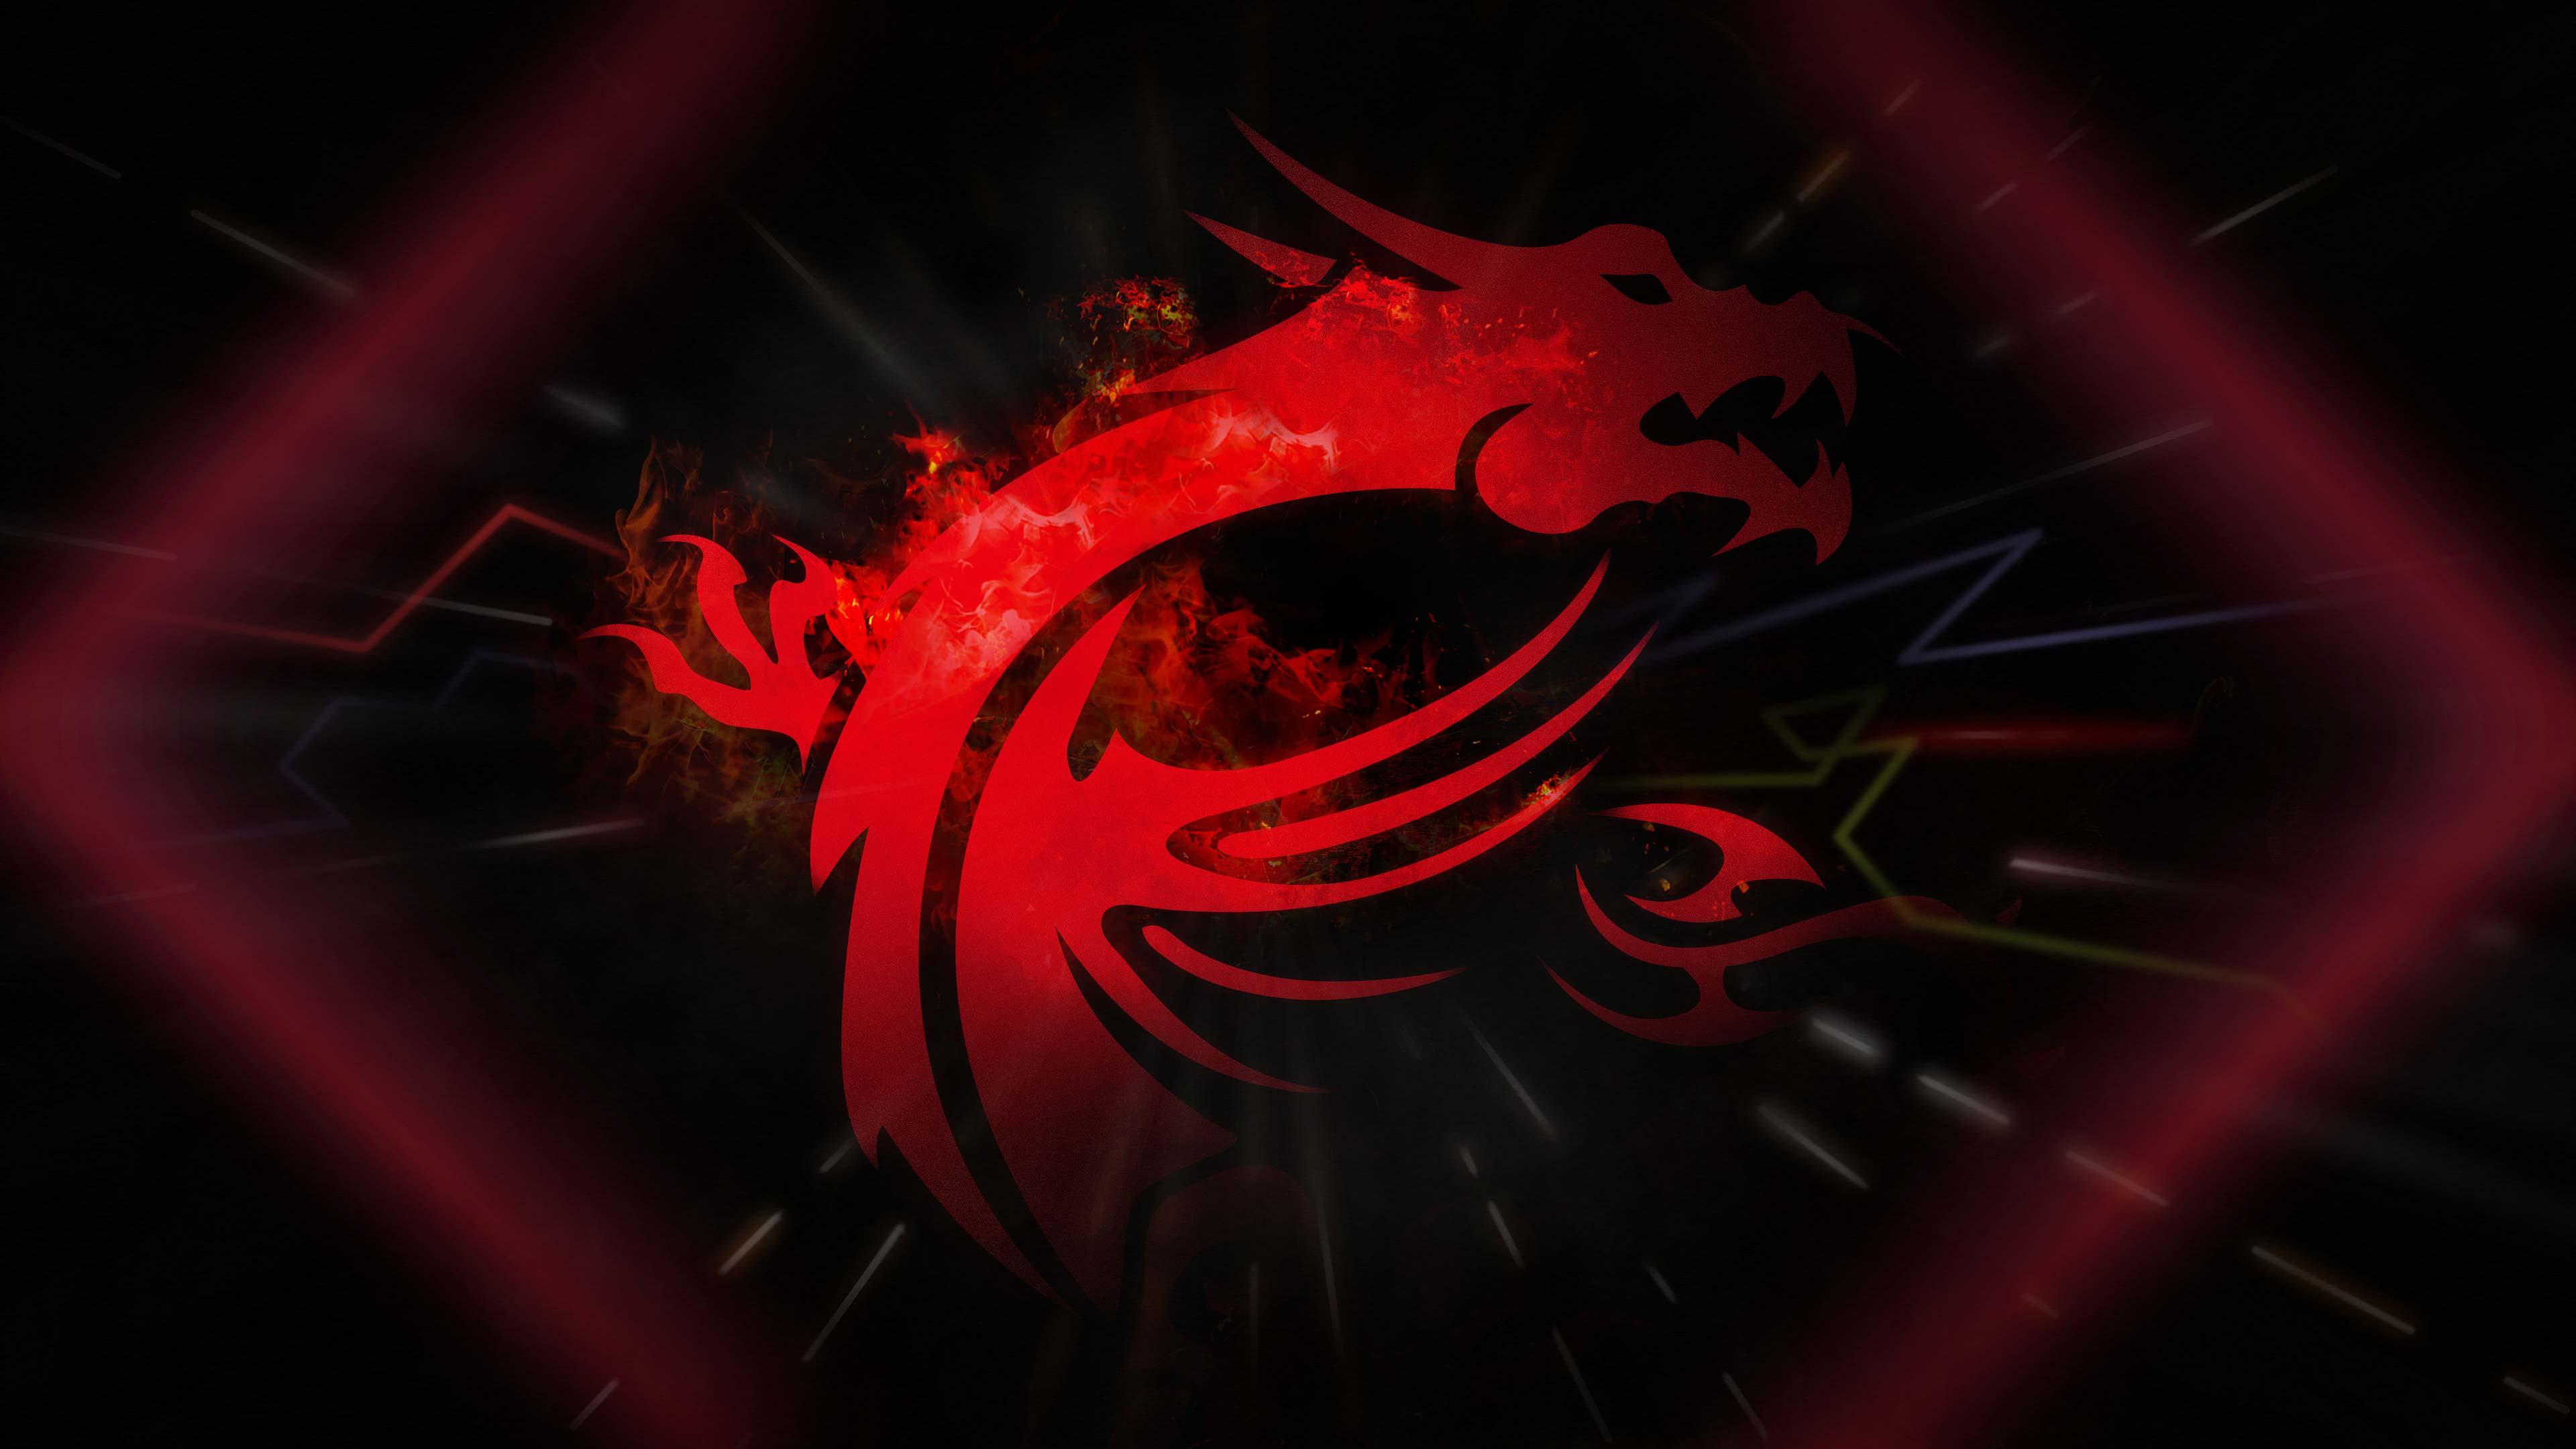 gamer storm gf 120 red